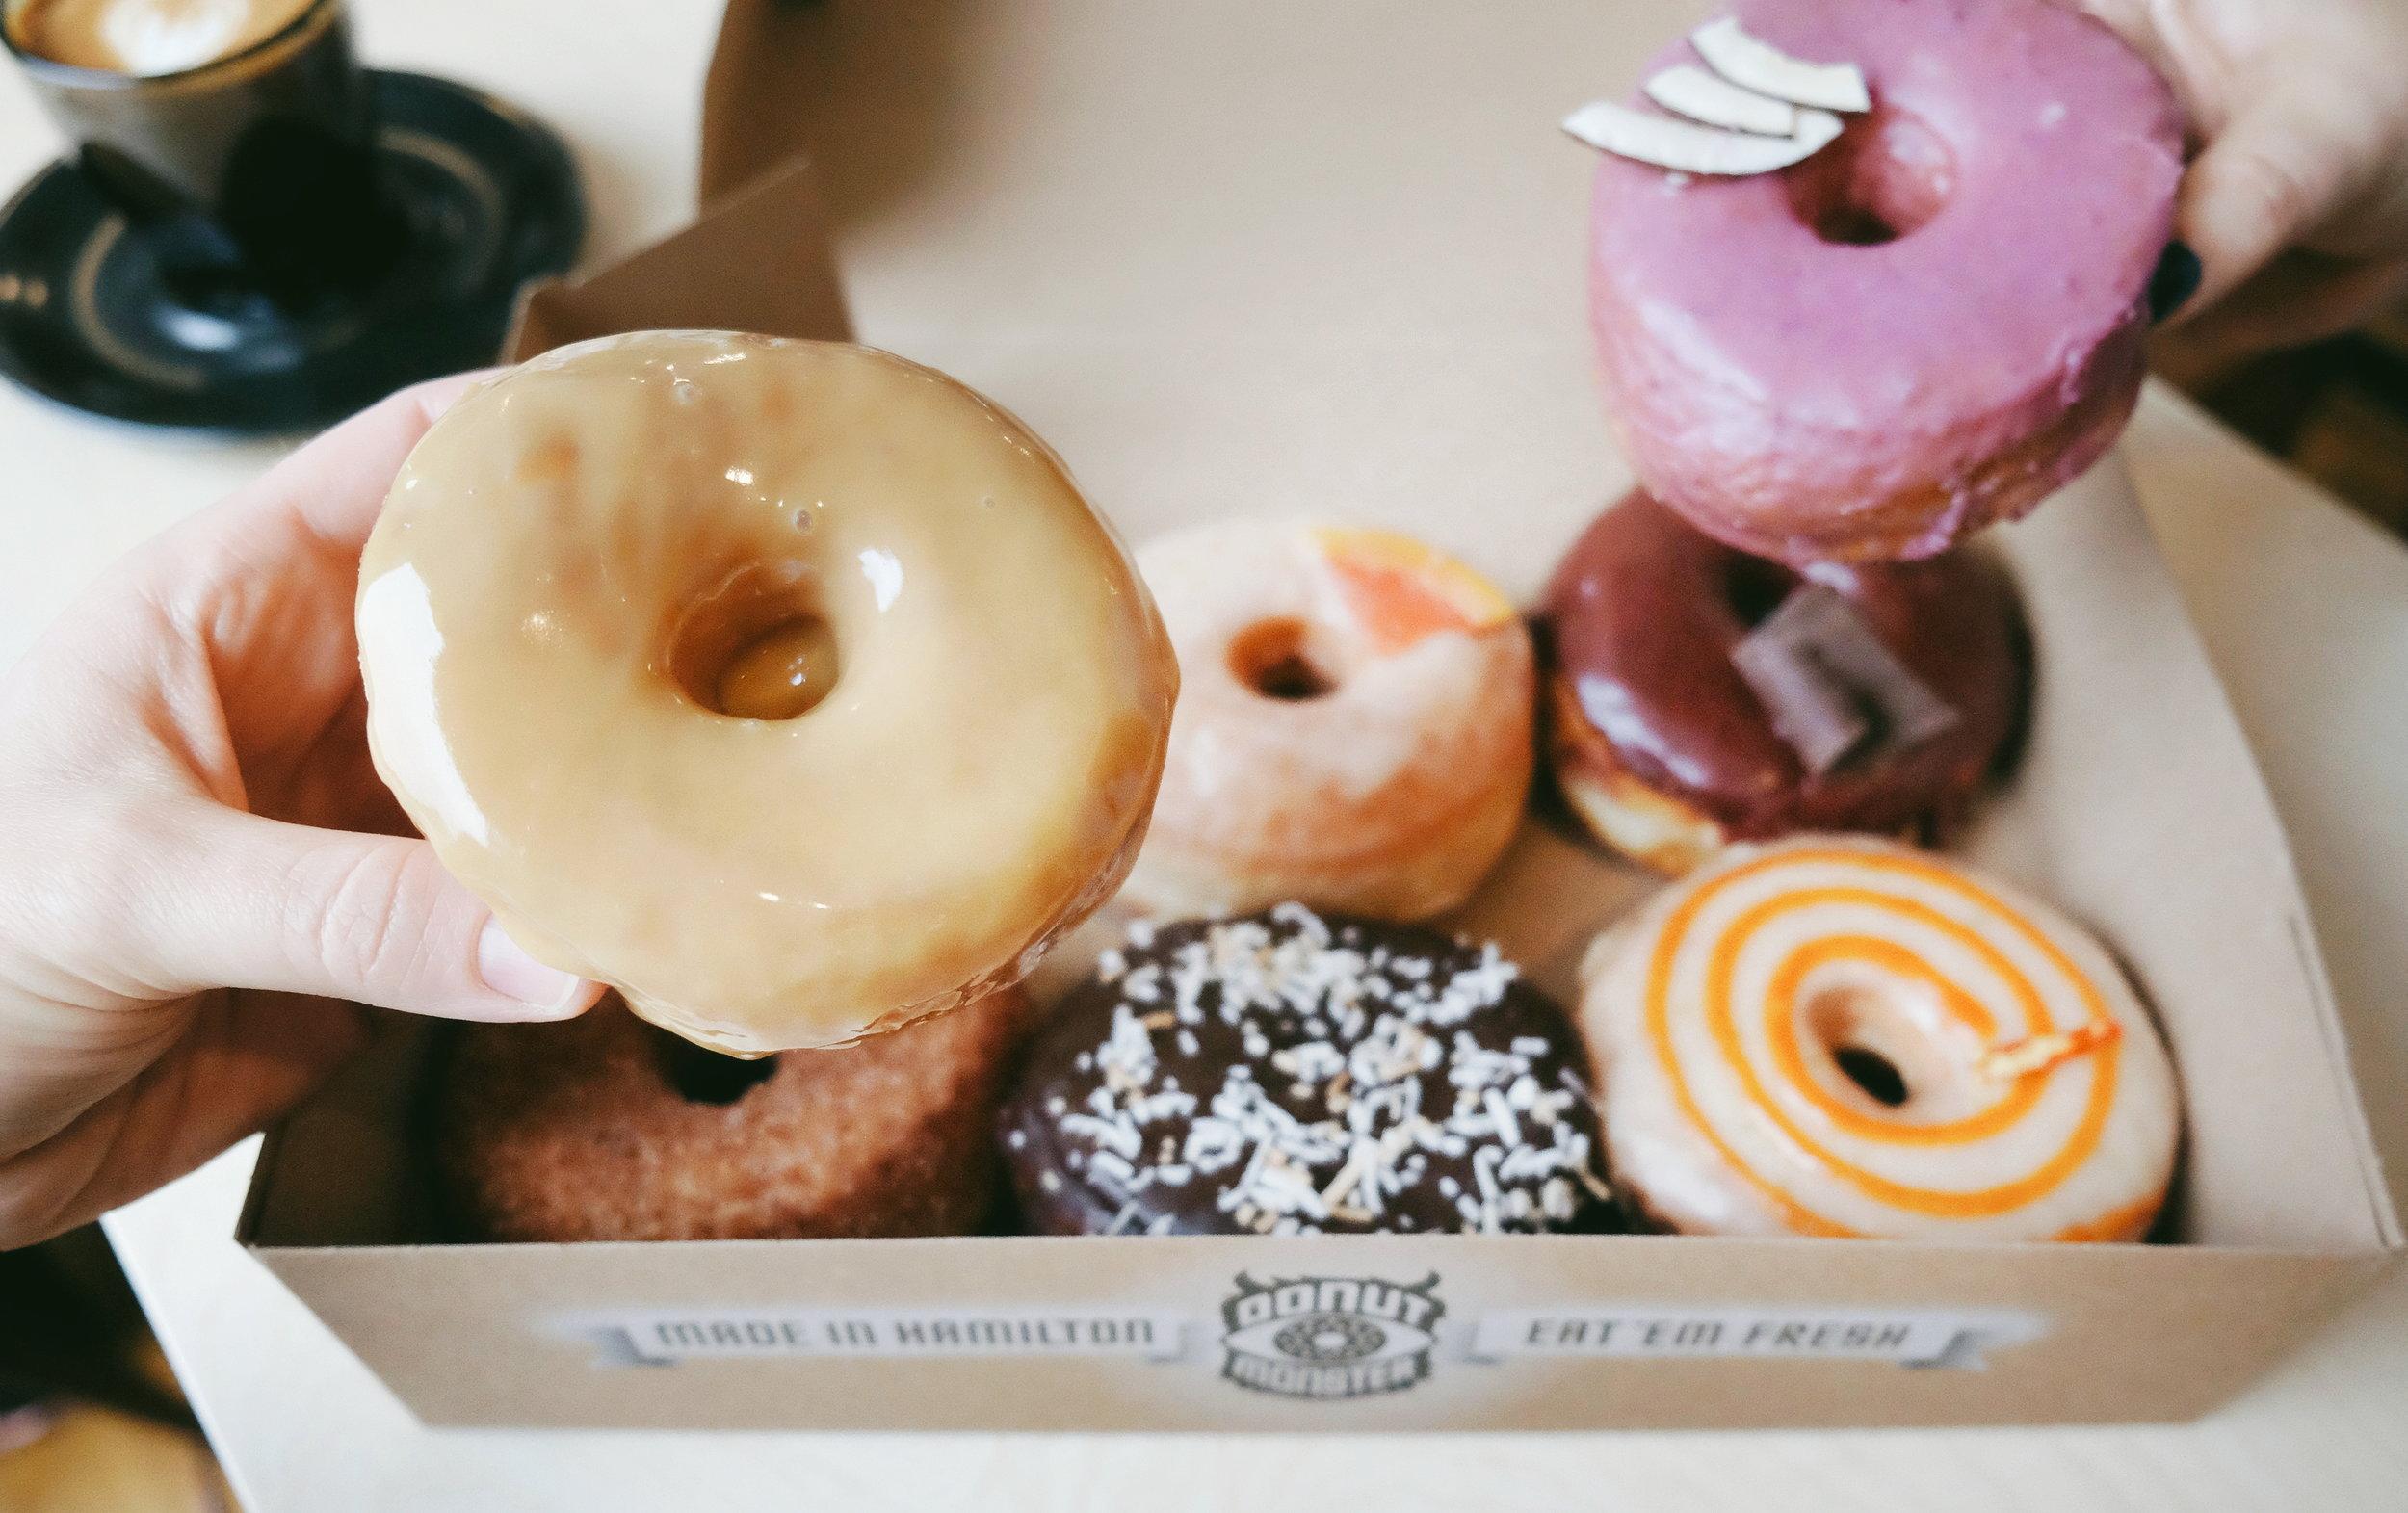 Photo from donutmonster.ca